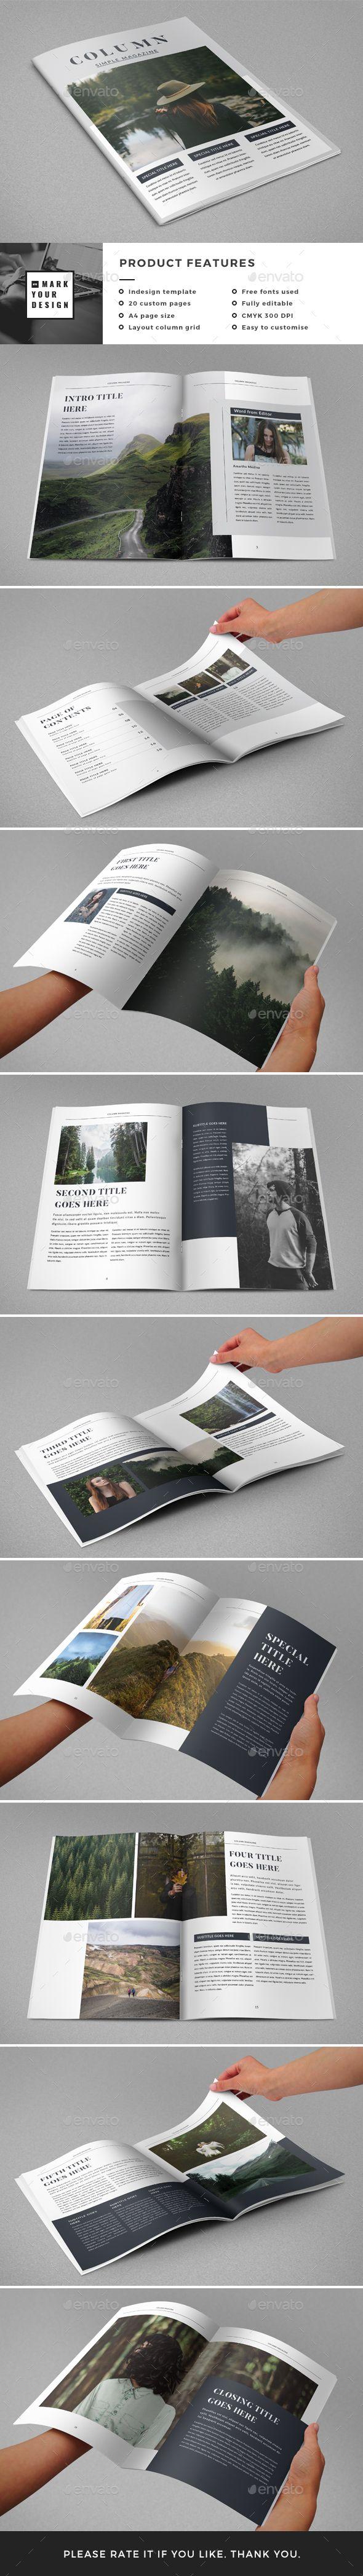 Simple Magazine - Magazines Print Templates Download here : https://graphicriver.net/item/simple-magazine/19076832?s_rank=93&ref=Al-fatih